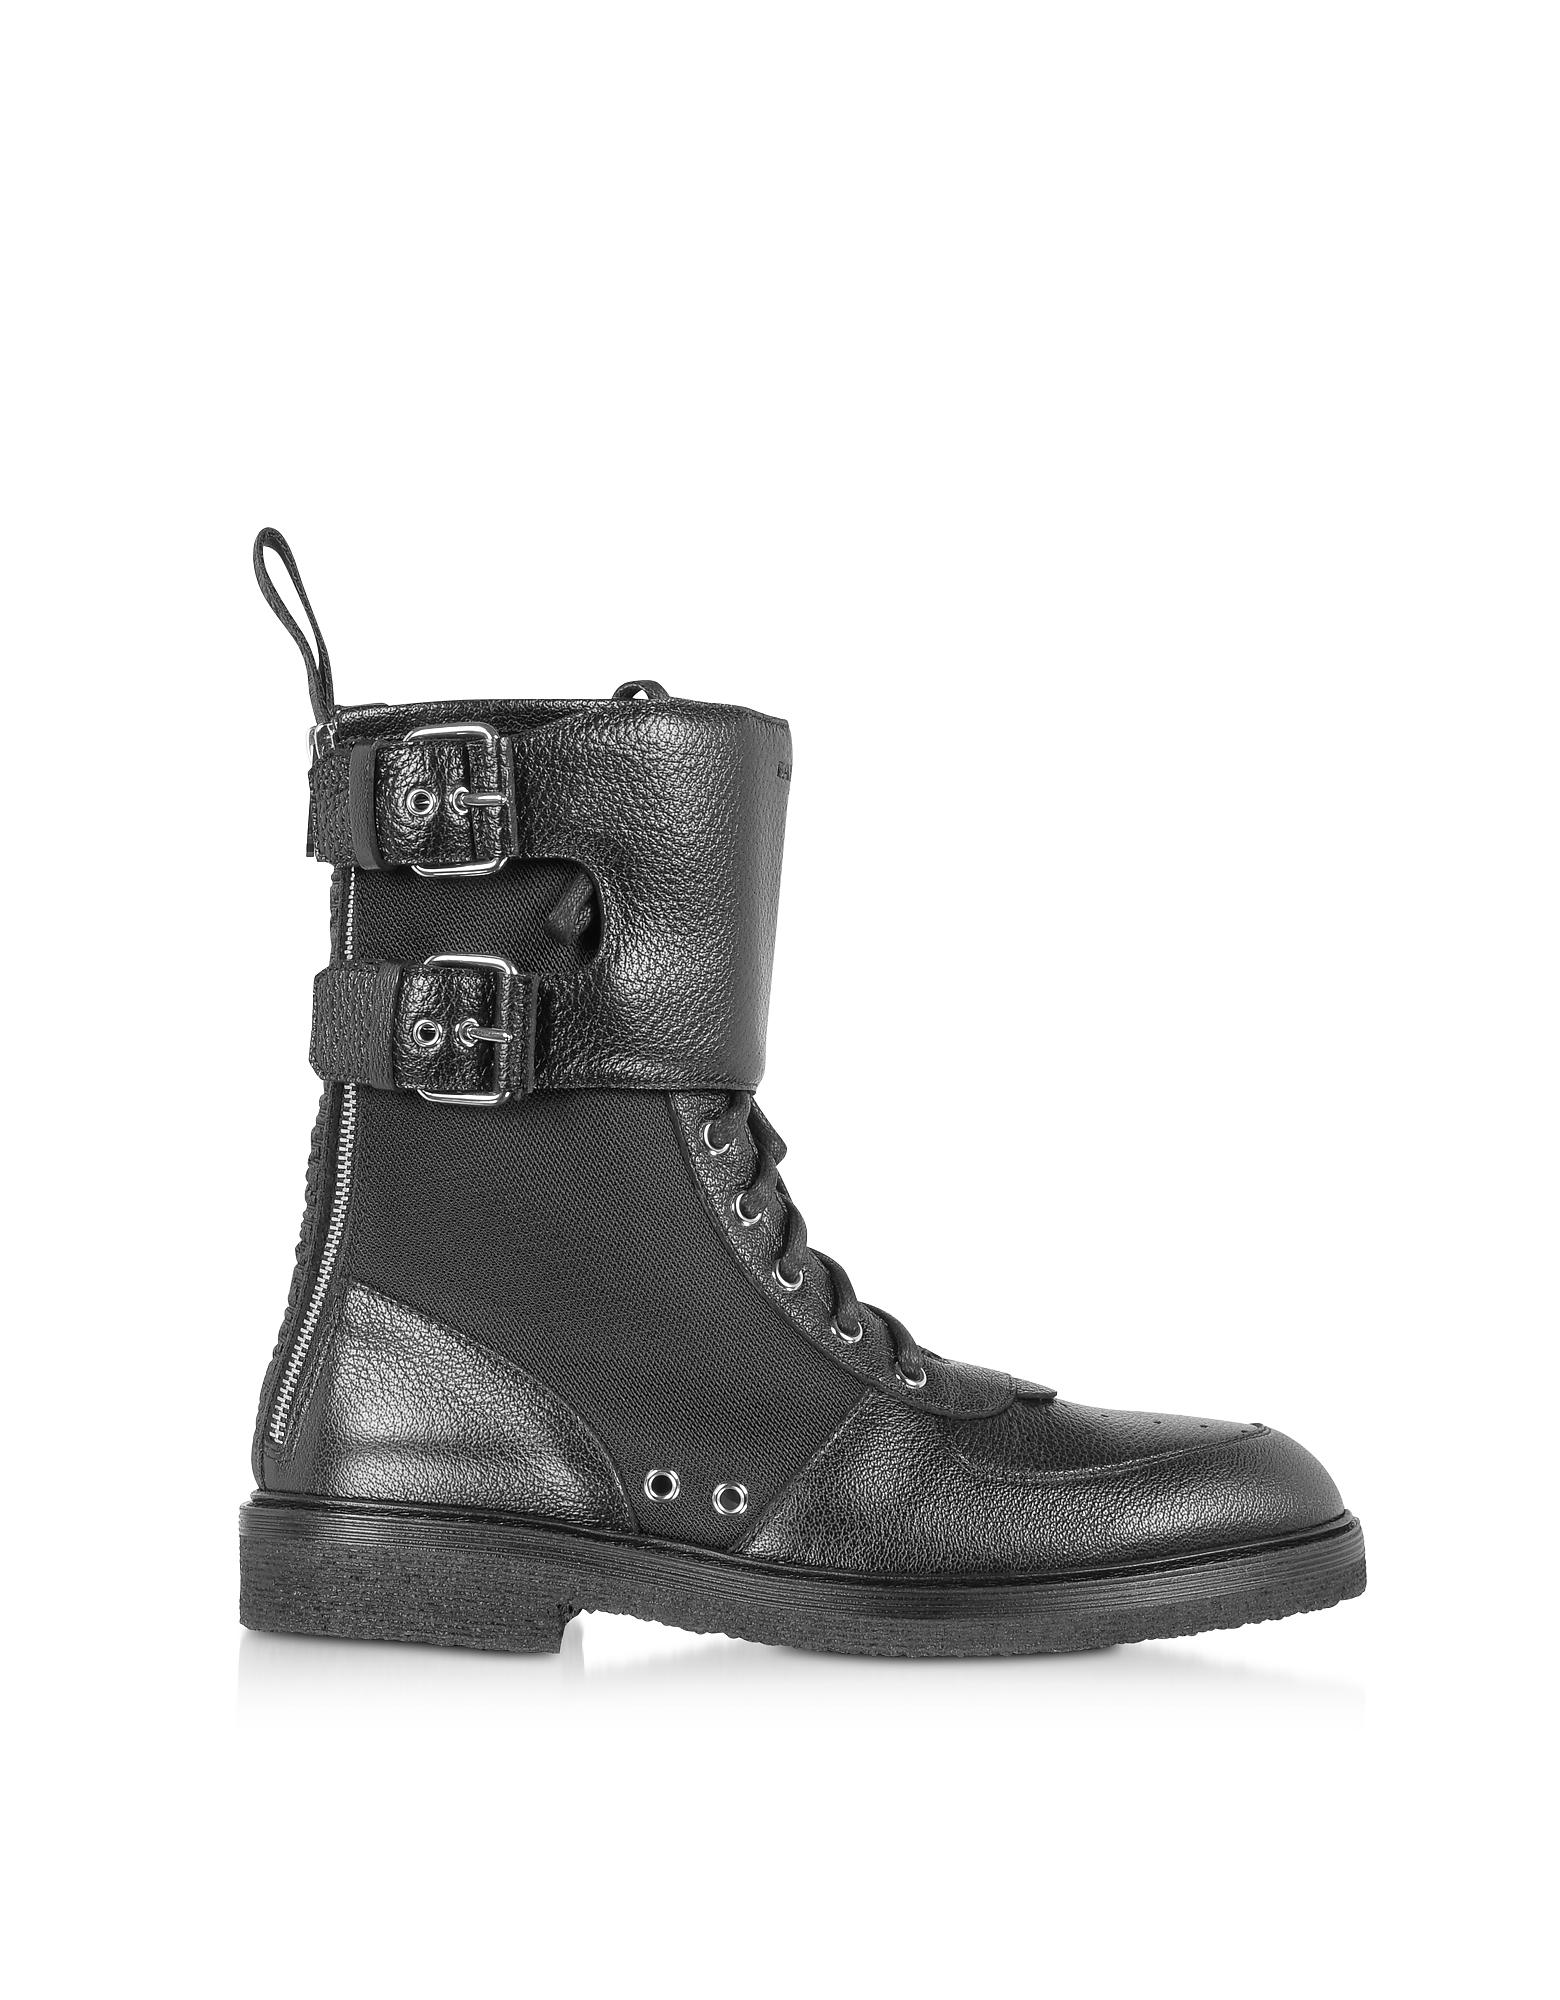 Balmain Designer Shoes, Leather & Nylon Maddox Ranger Boot